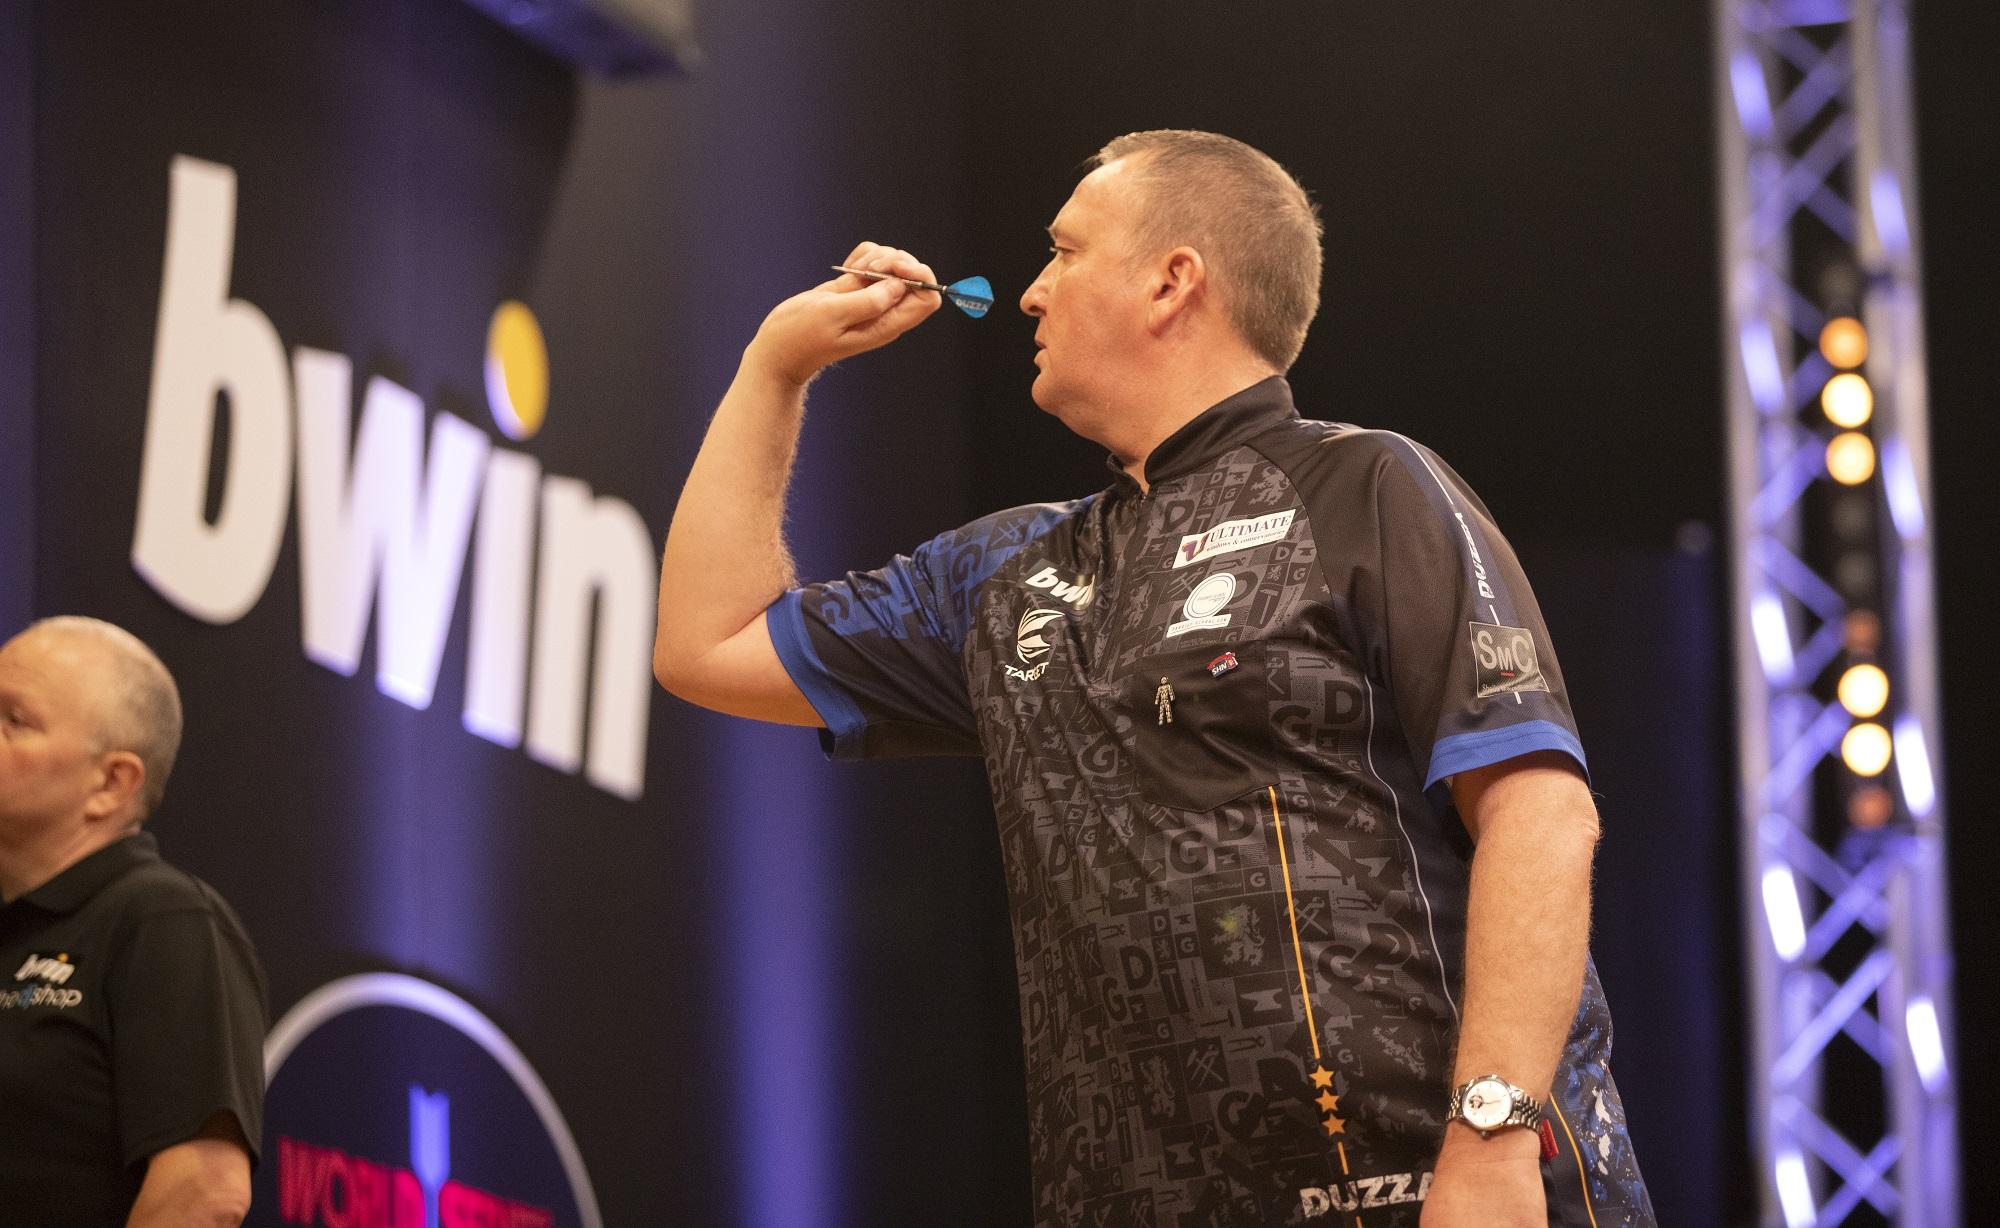 Glen Durrant's measured assessment of World Championship chance